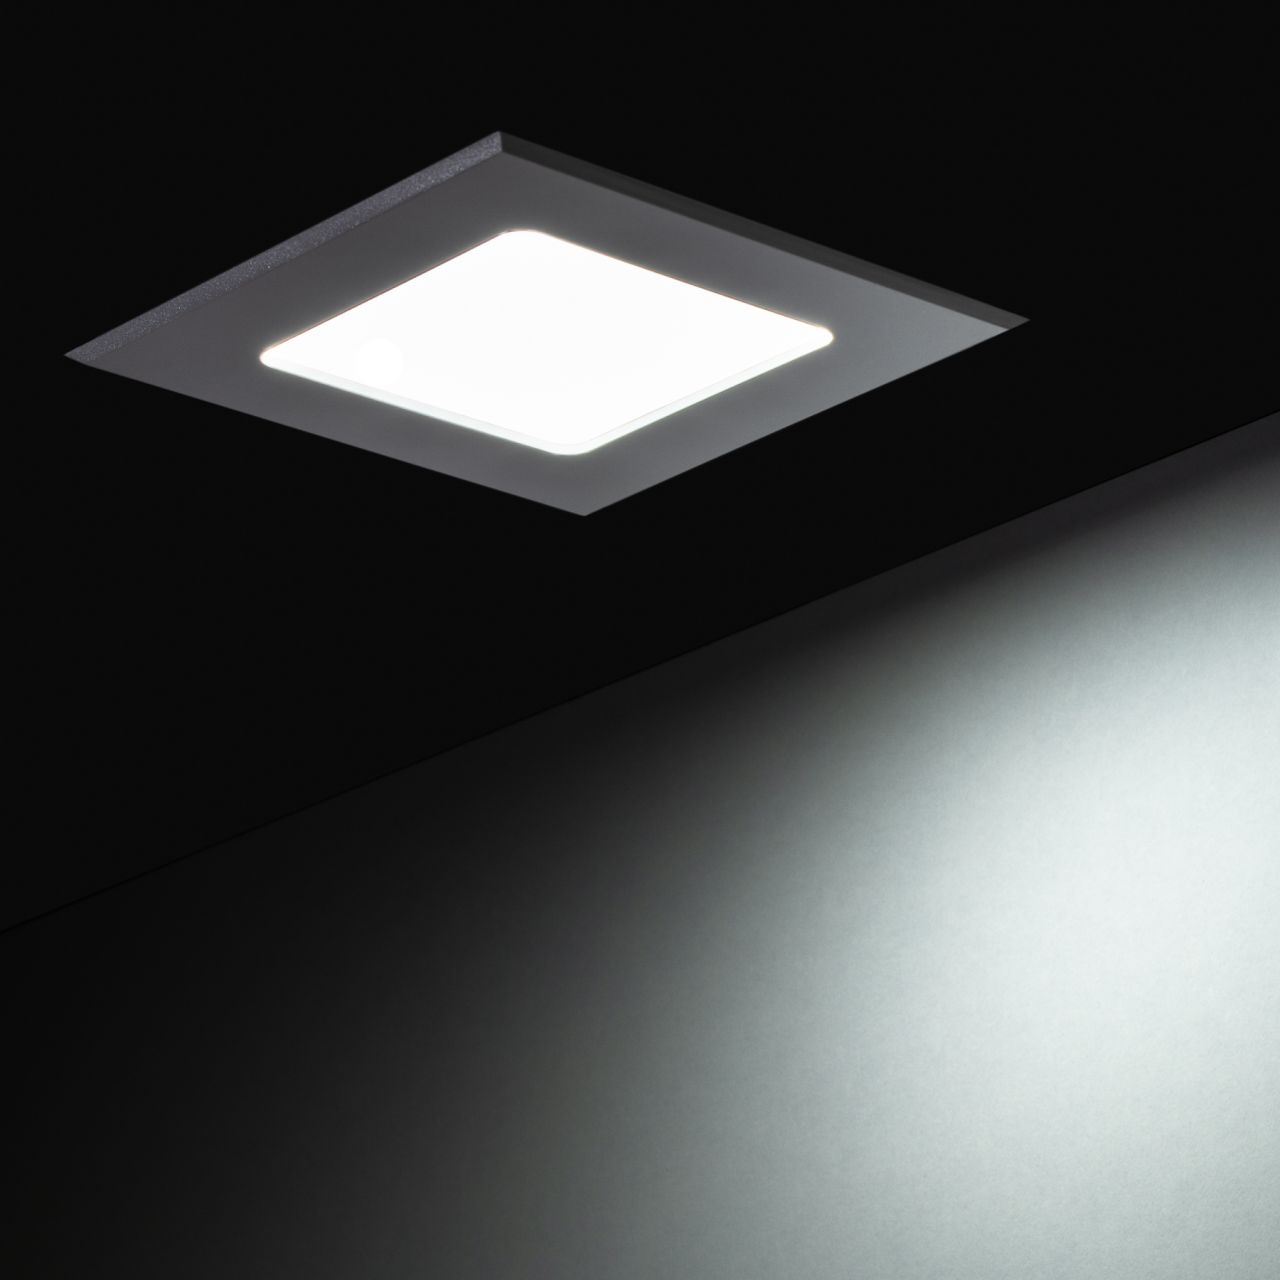 230V LED-Einbauleuchte – weiß – 30x30cm – eckig